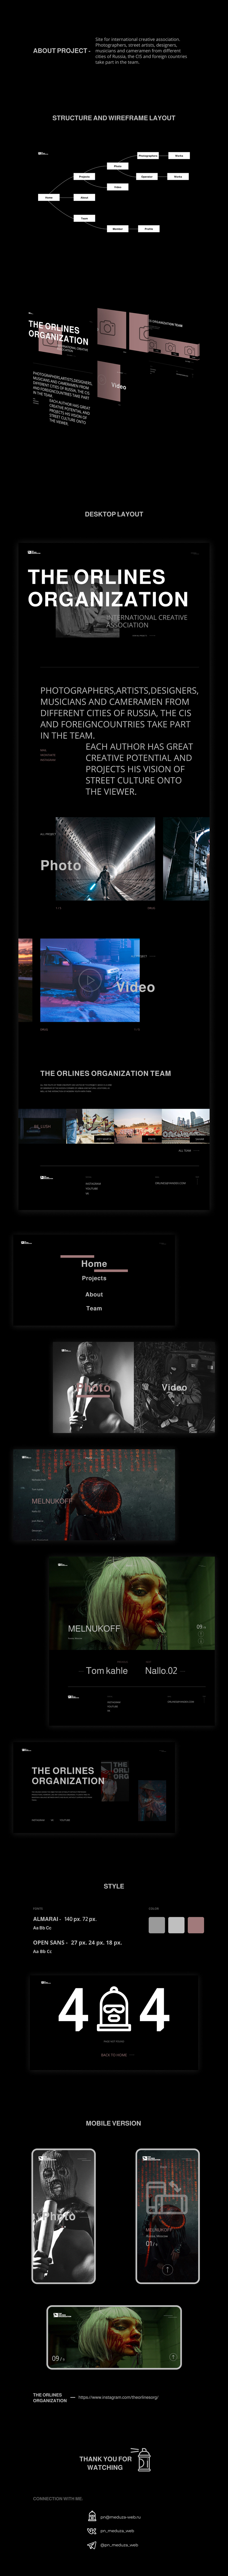 Behance Interface photoshop UI/UX Webdesign Website вебдизайн